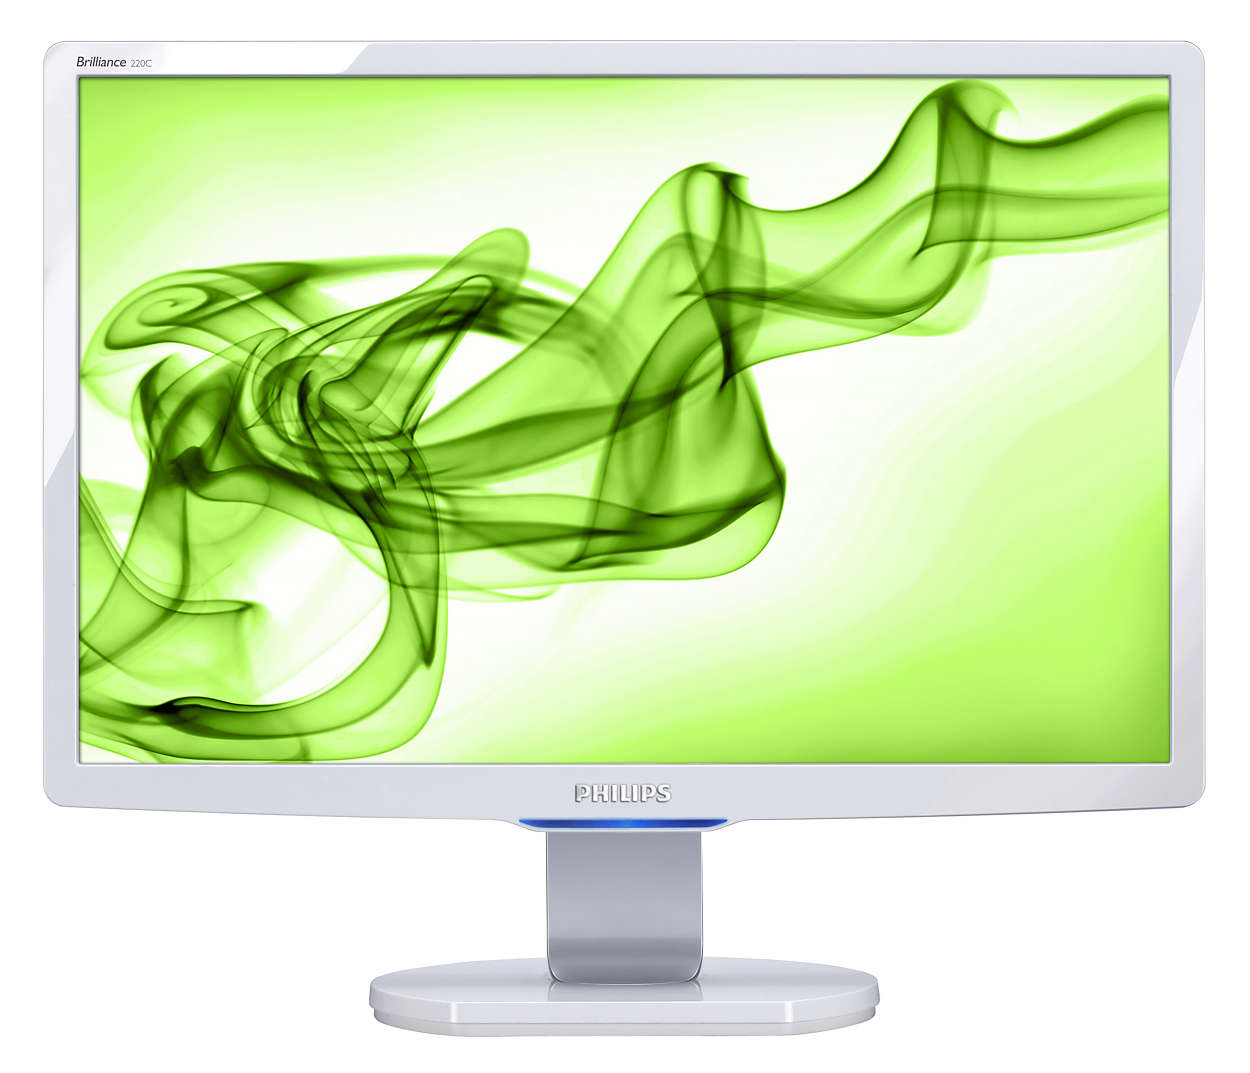 Stylový a funkcemi nabitý displej pro počítačovou zábavu